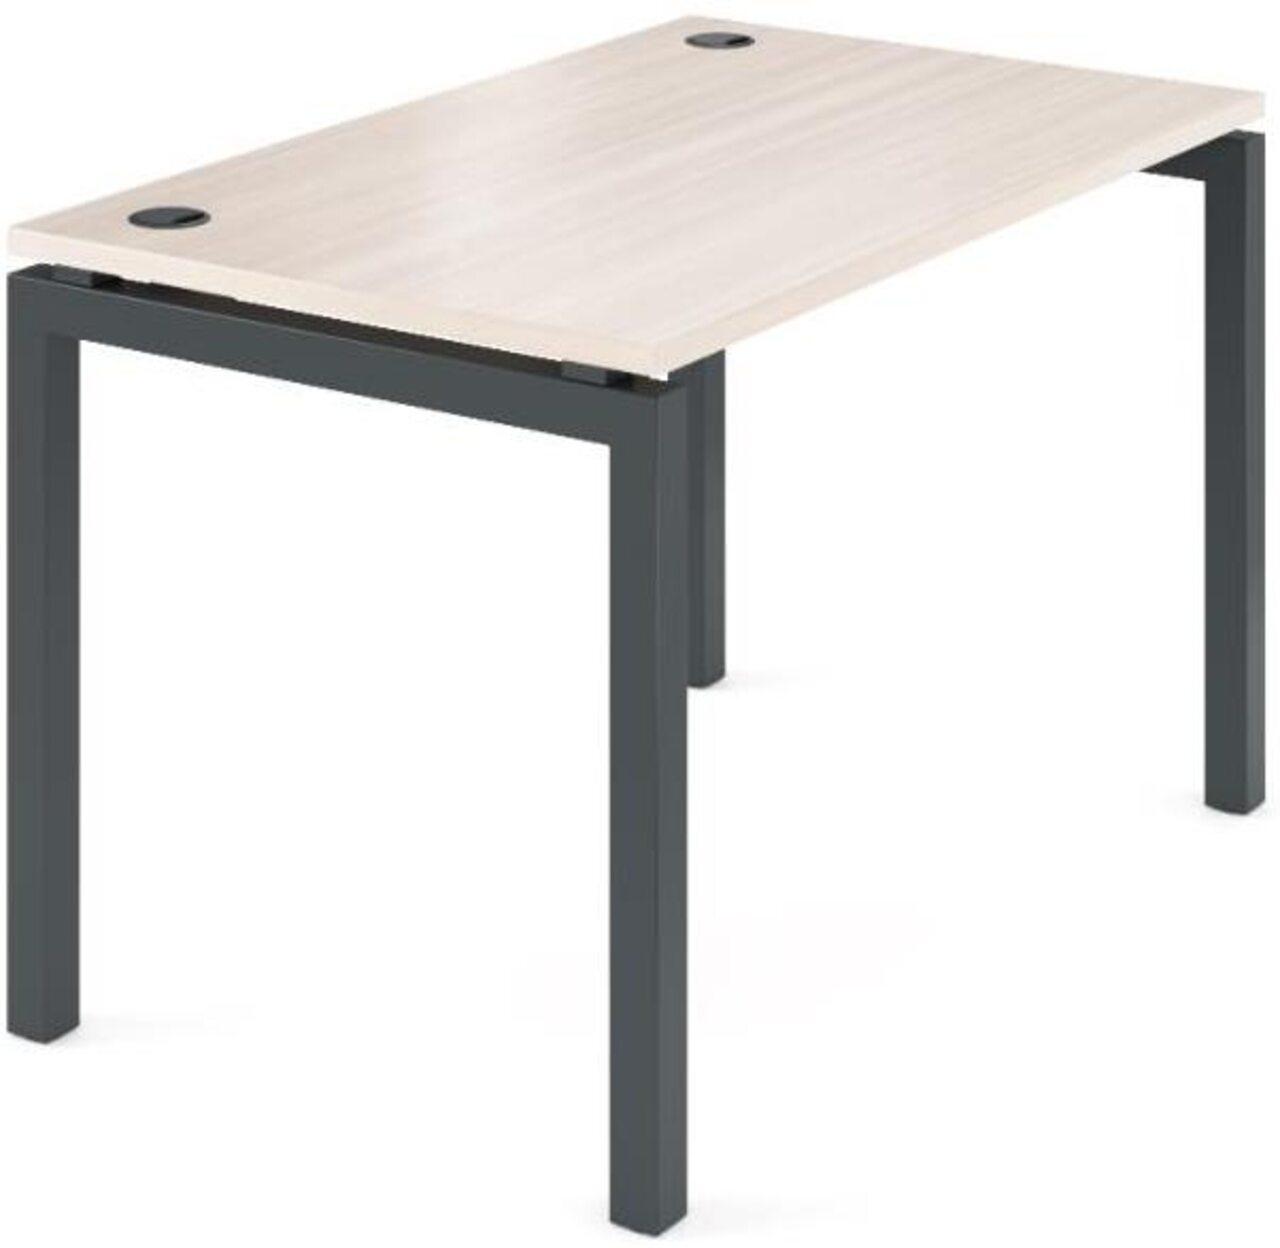 Стол на металлокаркасе  Арго 120x60x76 - фото 6